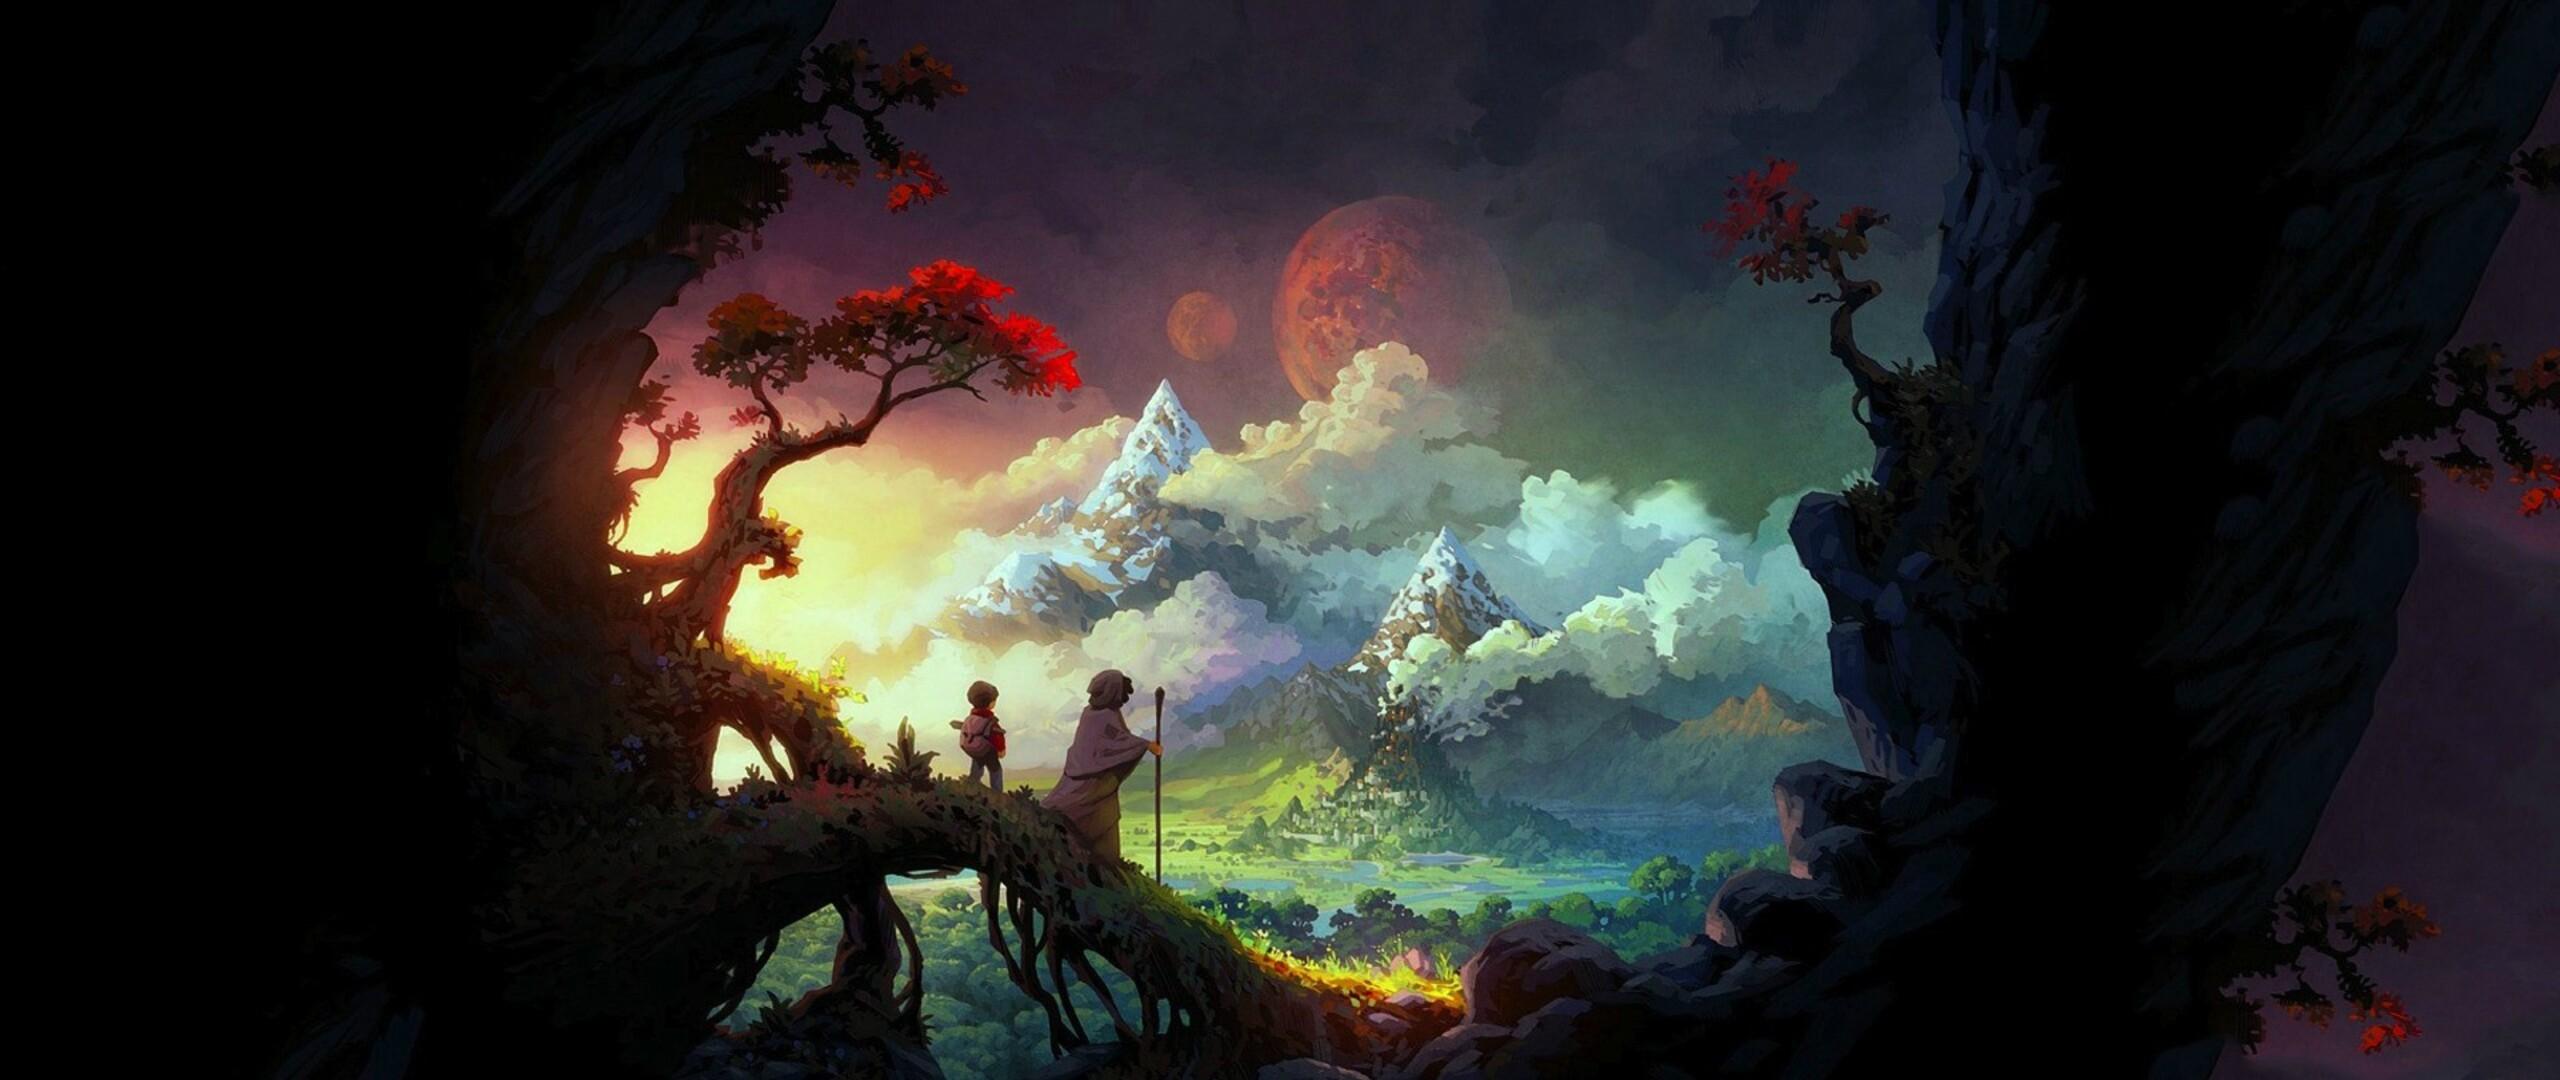 2560x1080 Final Fantasy Xv Artwork 2560x1080 Resolution Hd: 2560x1080 Fantasy Art Colorful 2560x1080 Resolution HD 4k